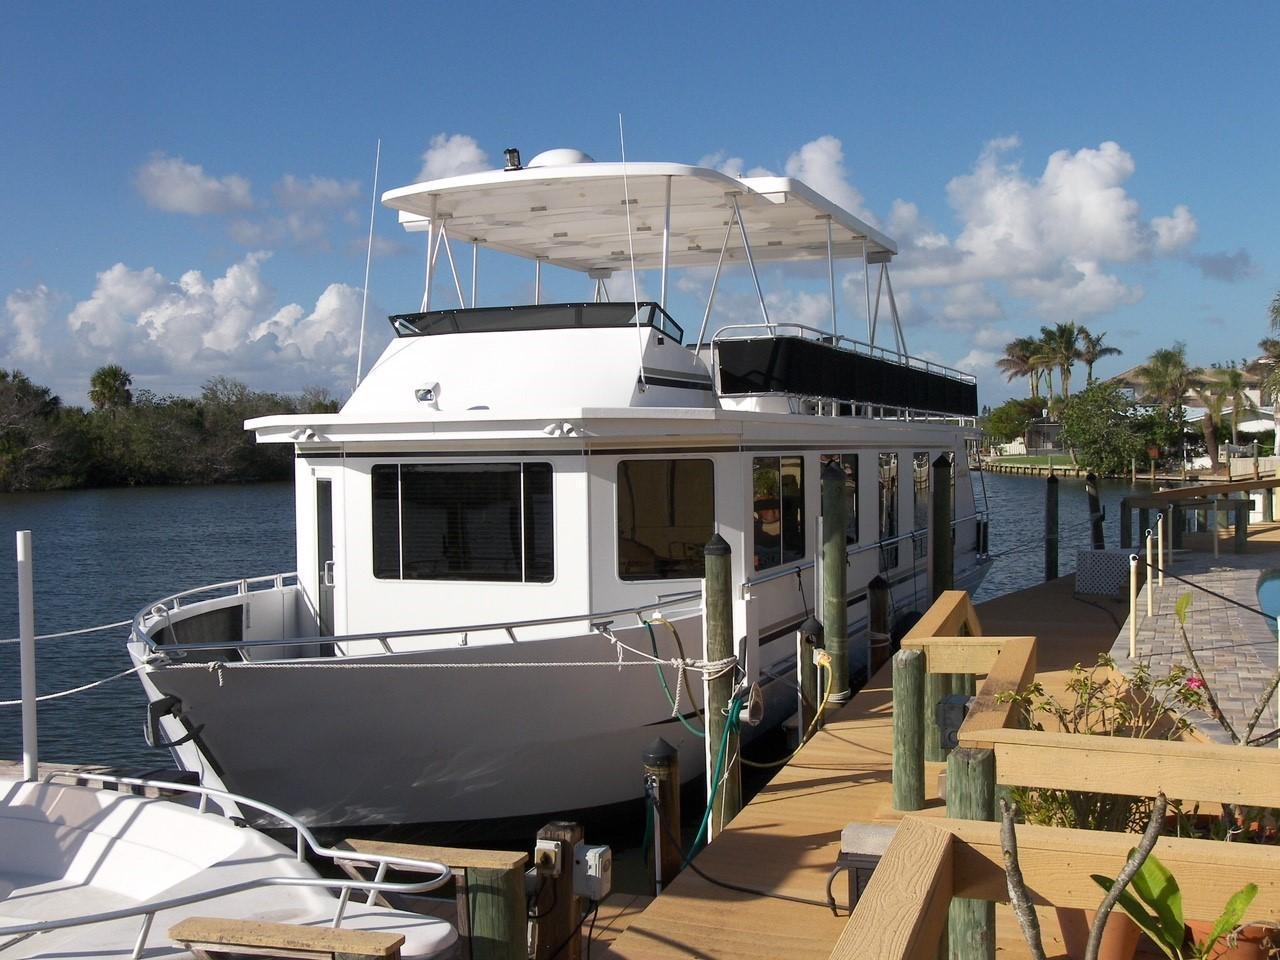 2013 used sunstar coastal cruiser house boat for sale 299 000 cocoa beach fl. Black Bedroom Furniture Sets. Home Design Ideas